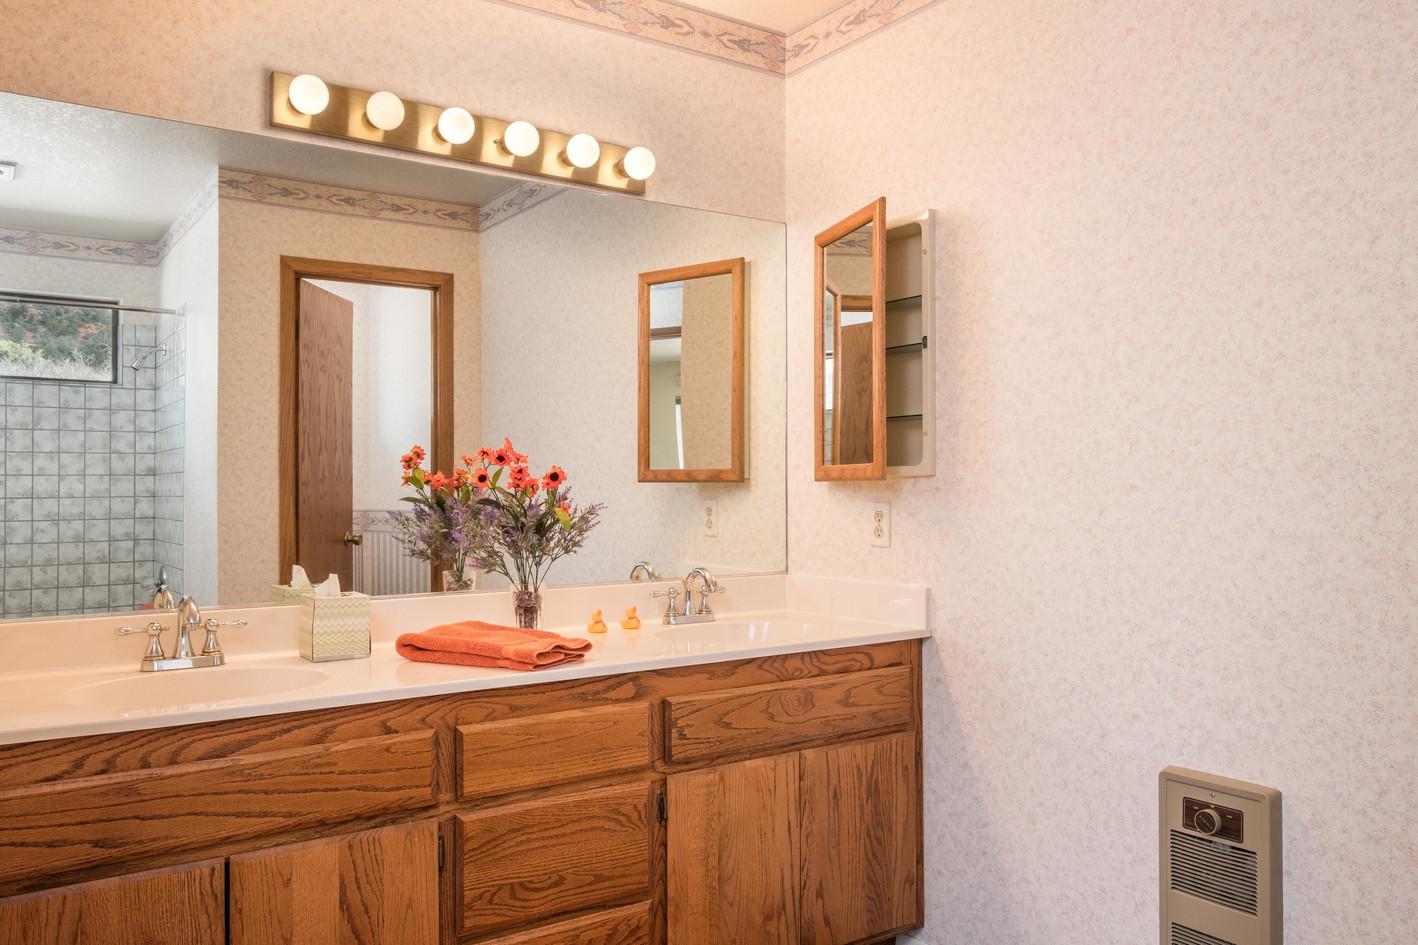 Master Bath, 2 sink vanity